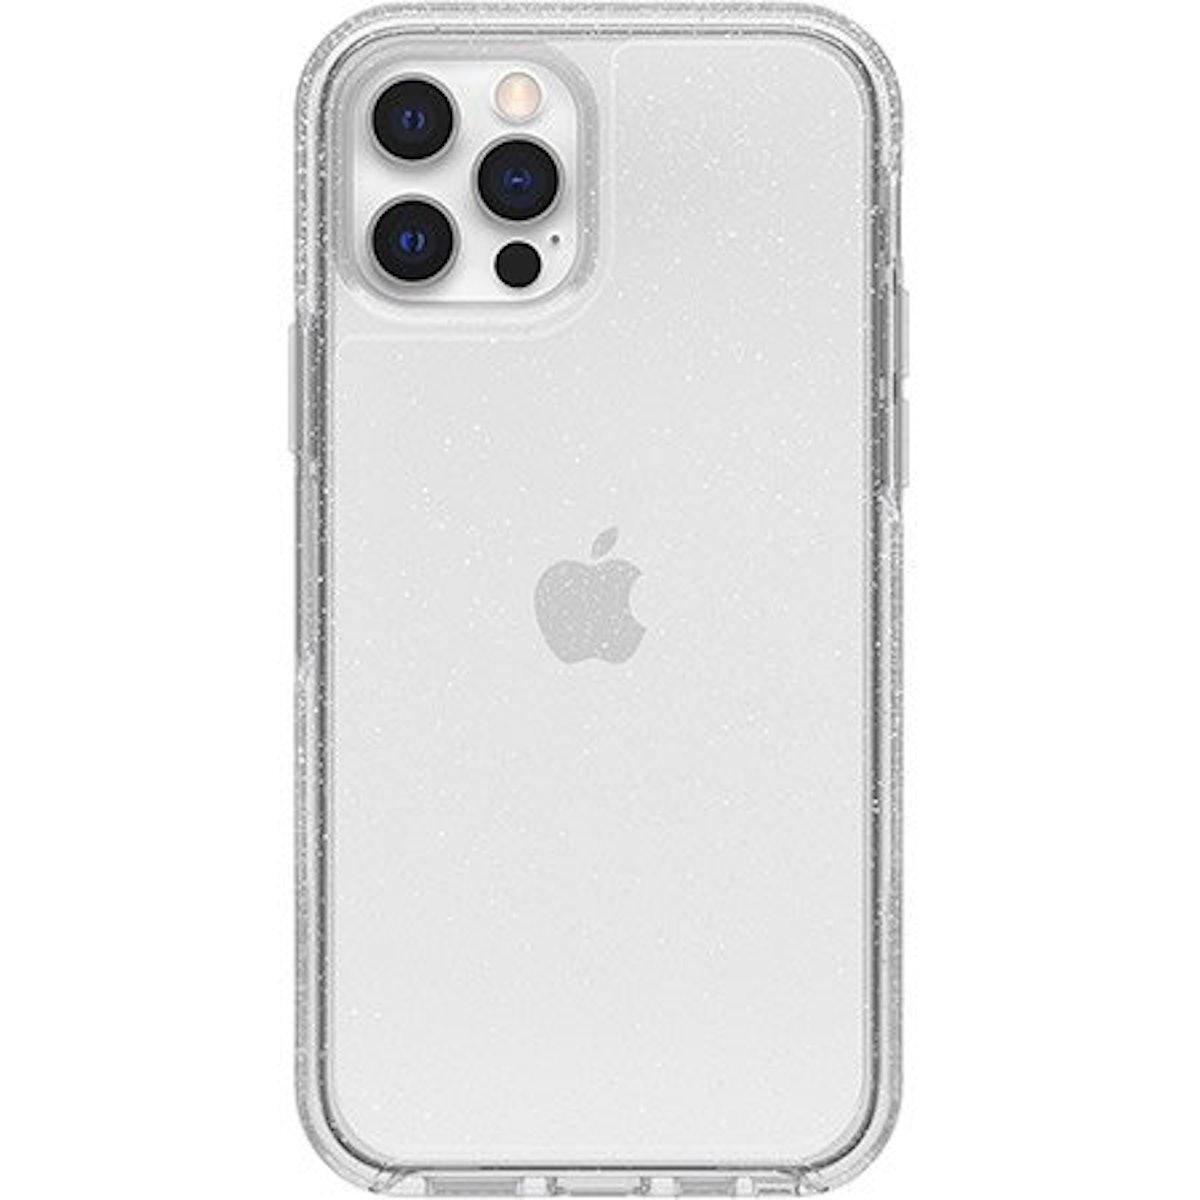 iPhone 12 Symmetry Series Clear Case in Stardust Glitter